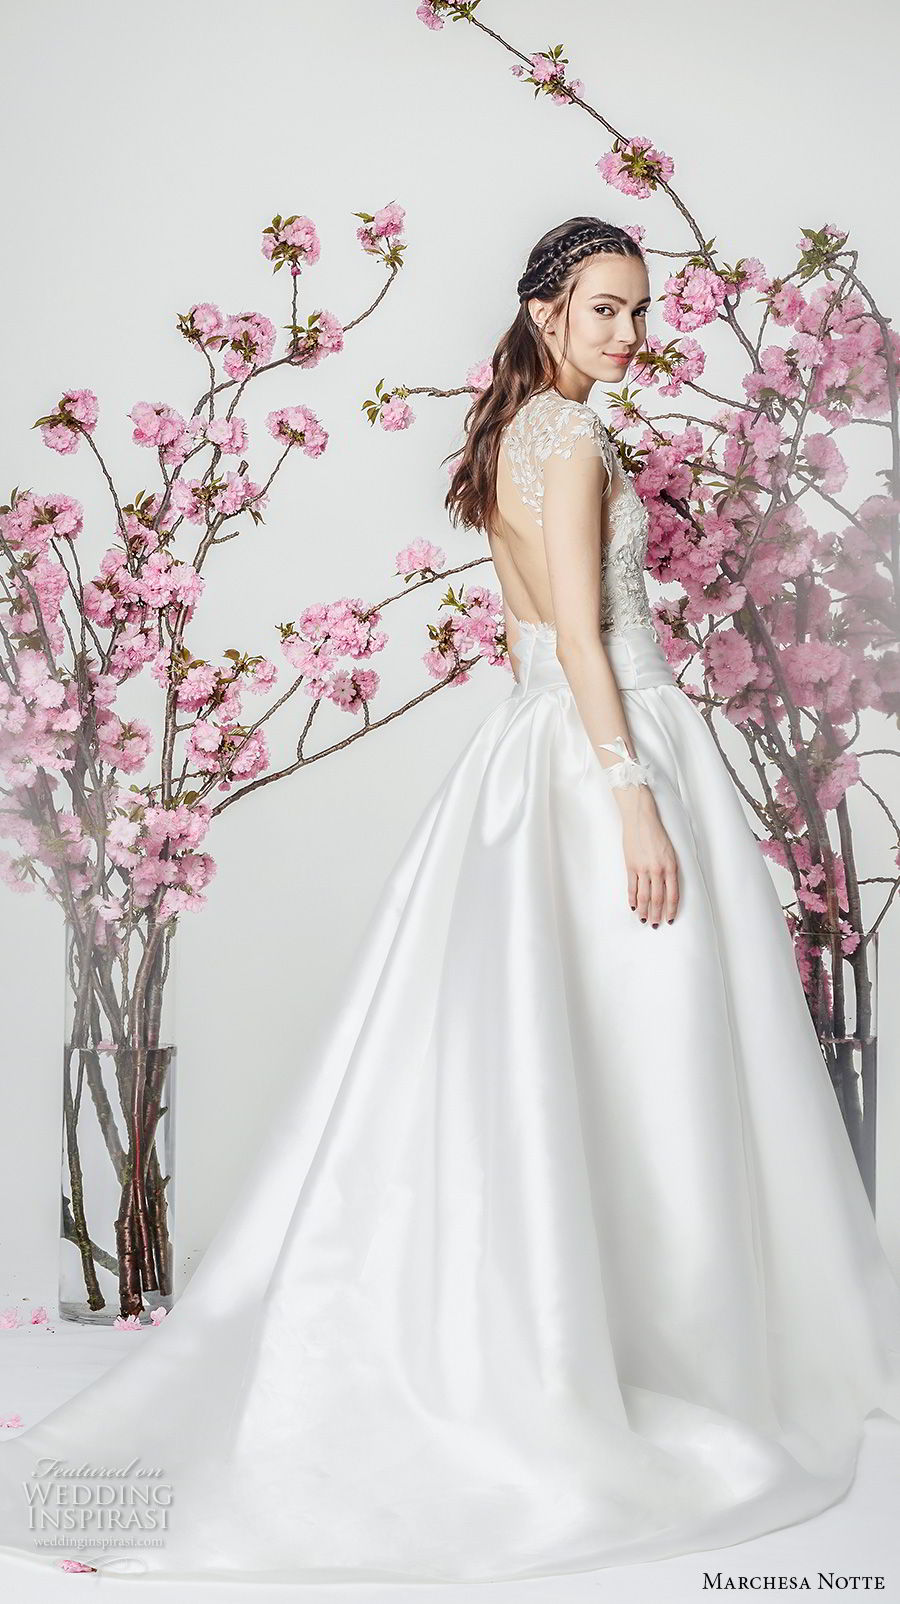 marchesa notte spring 2018 bridal cap sleeves sccop neckline heavily embellished bodice satin skirt romantic a  line wedding dress with pockets chapel train (14) sdv